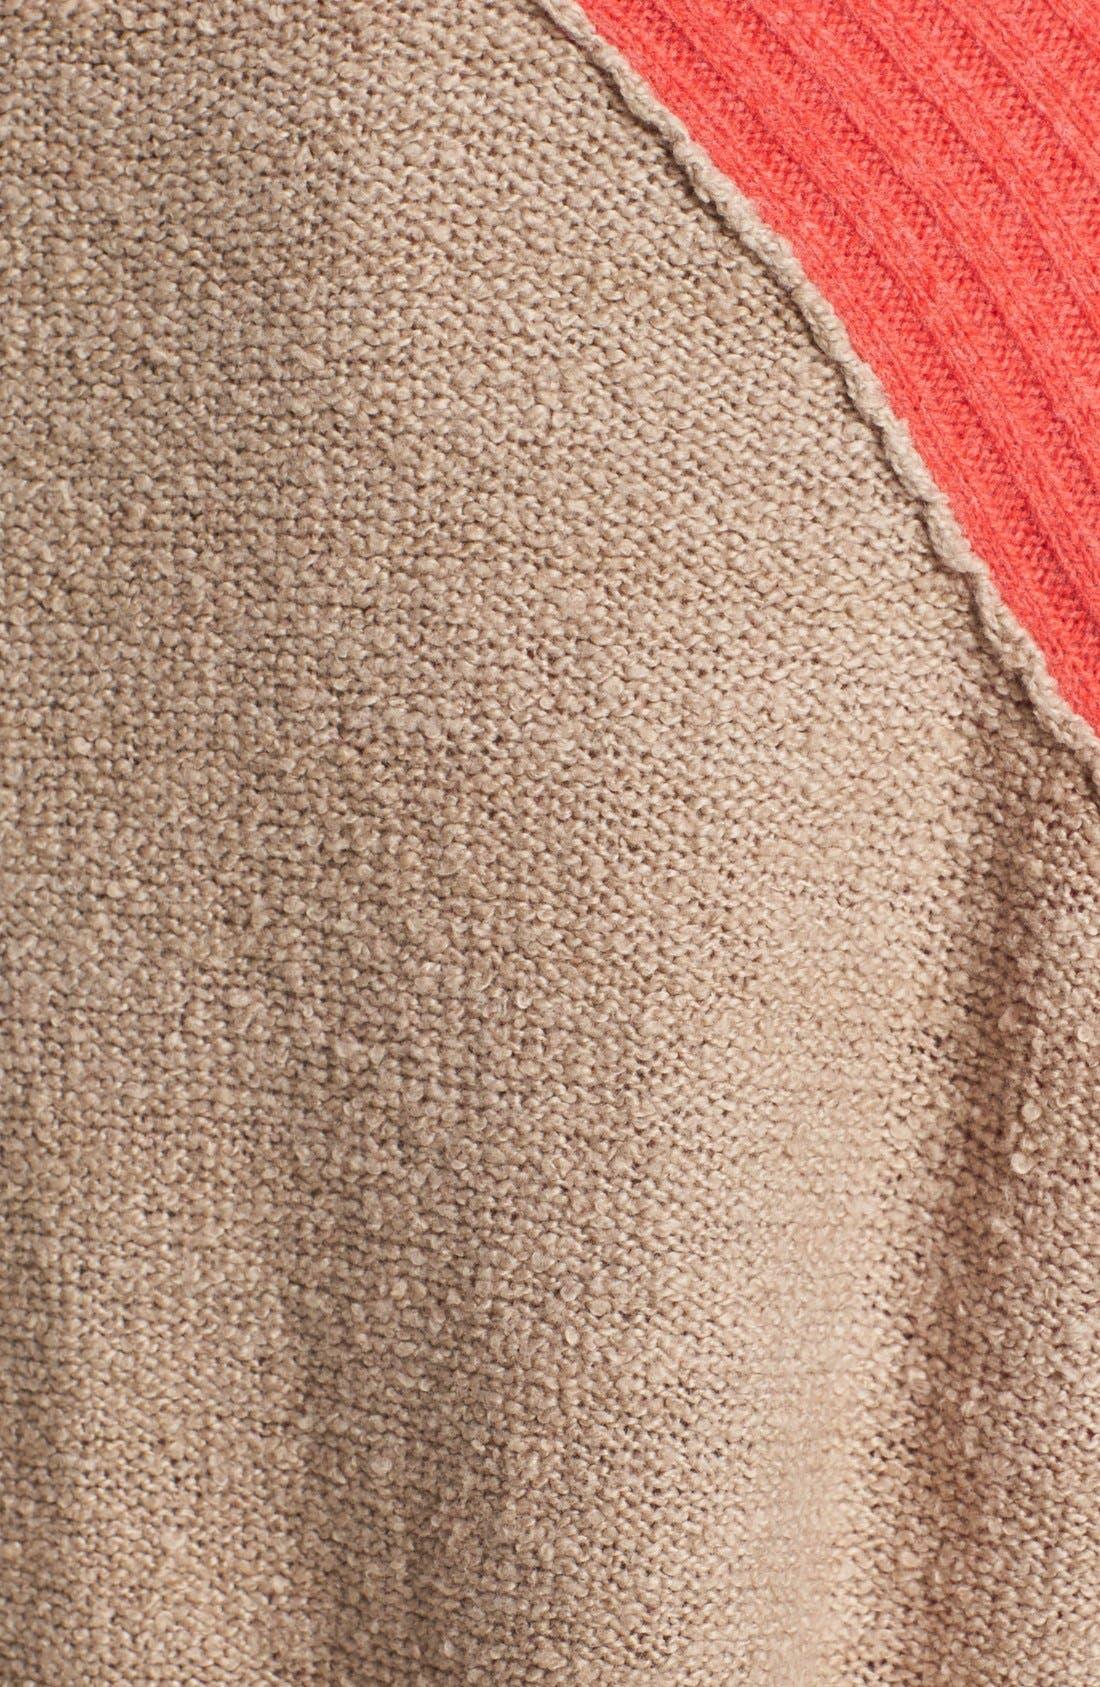 Alternate Image 3  - Free People 'Tabbard' Pullover Sweater